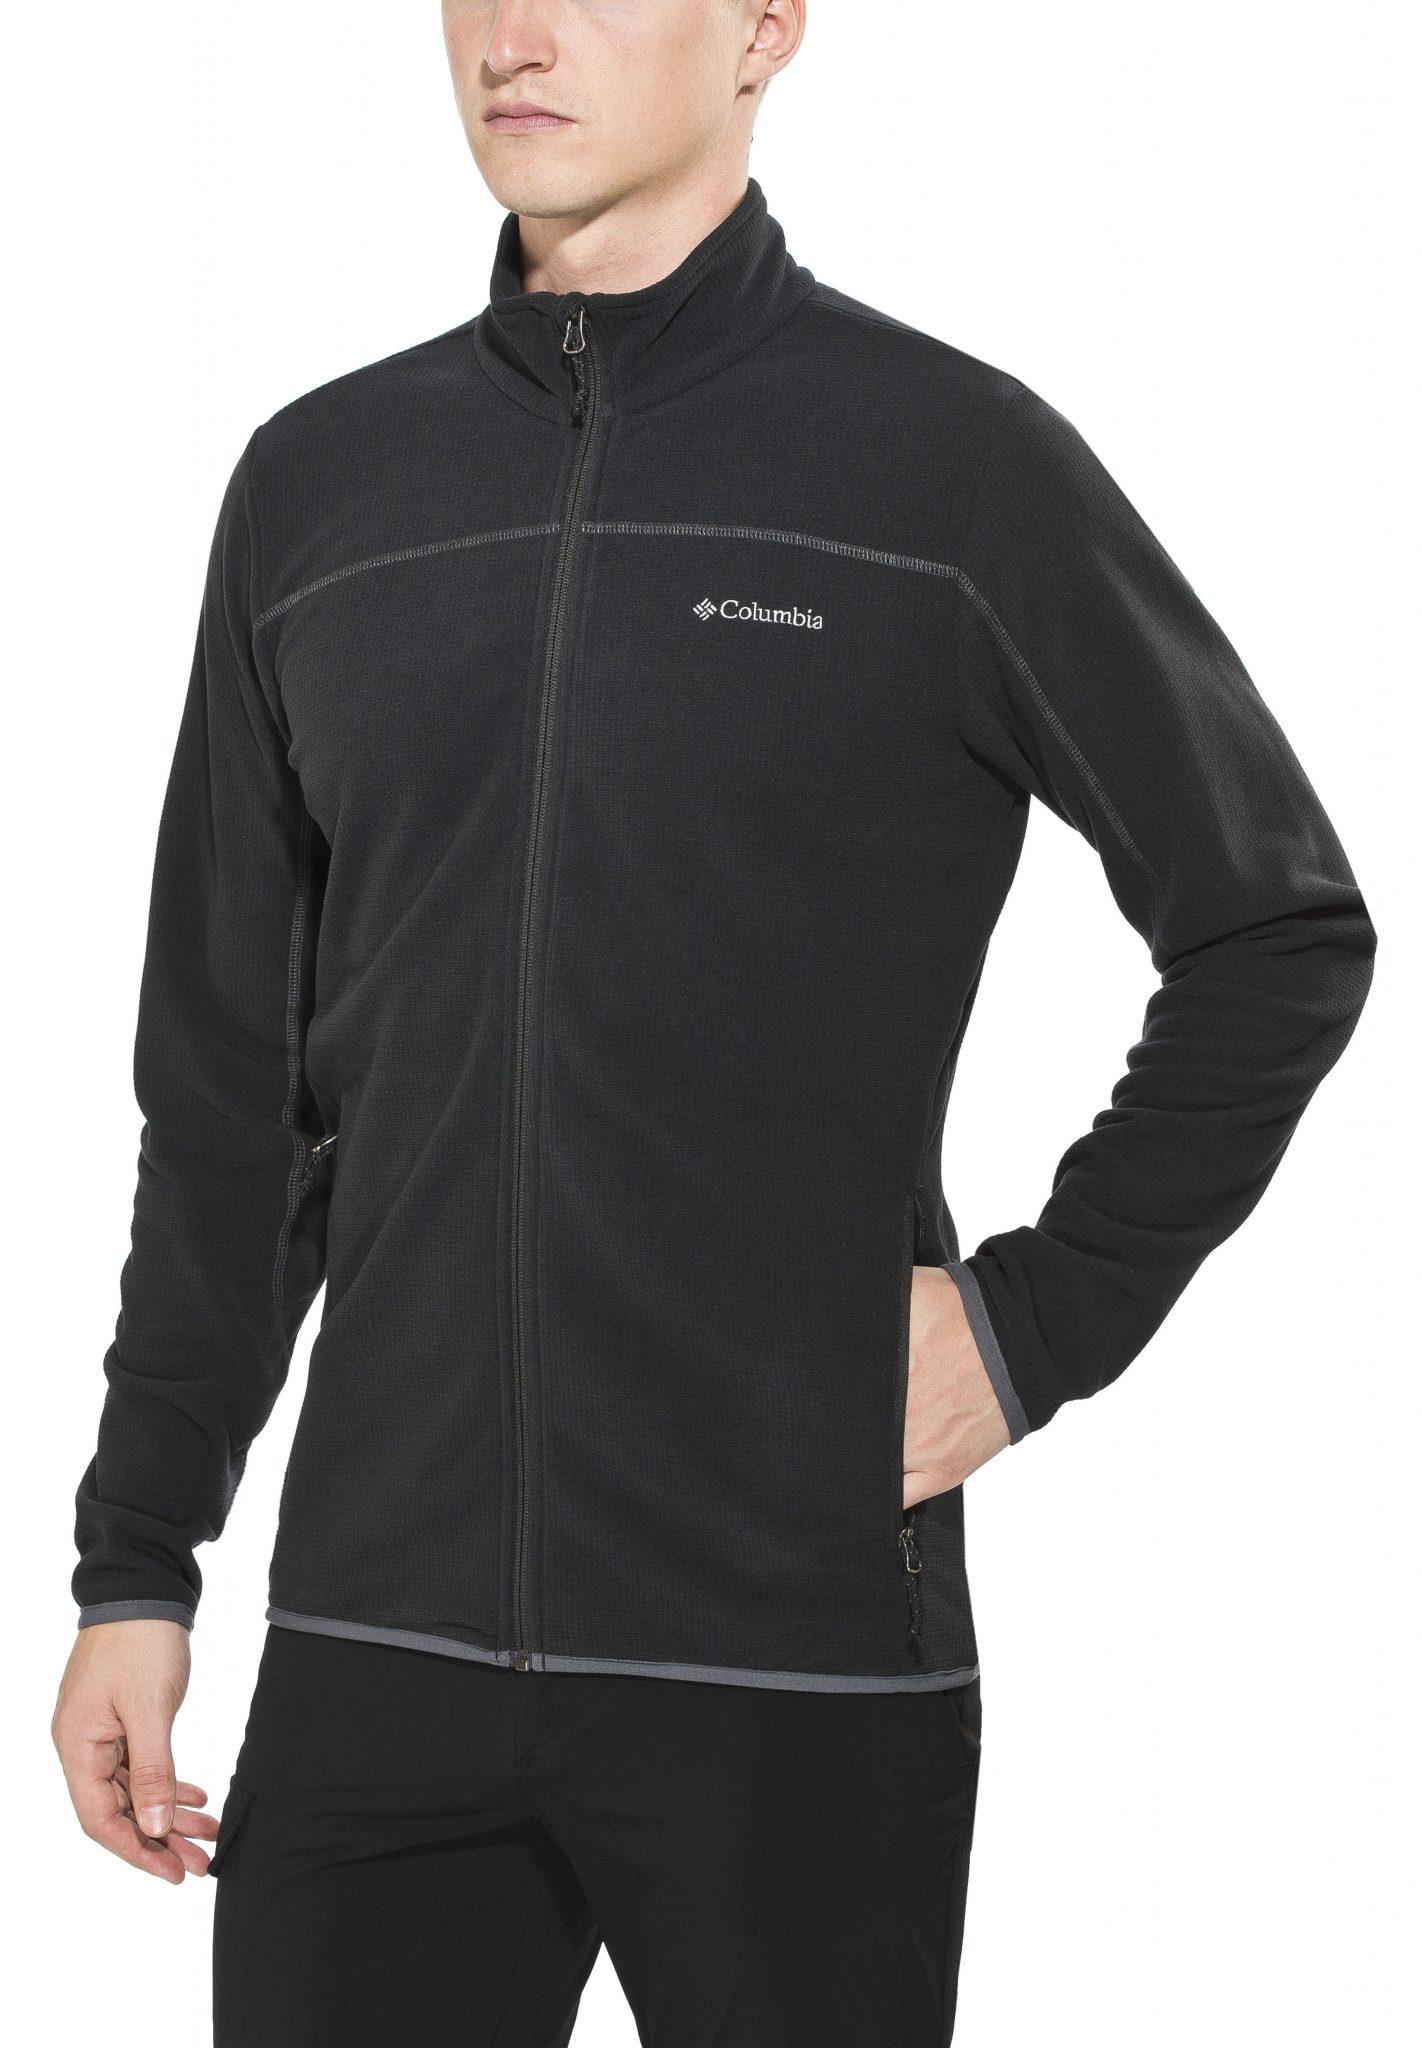 Columbia Outdoorjacke »Trails Edge Fleece Jacket Men«